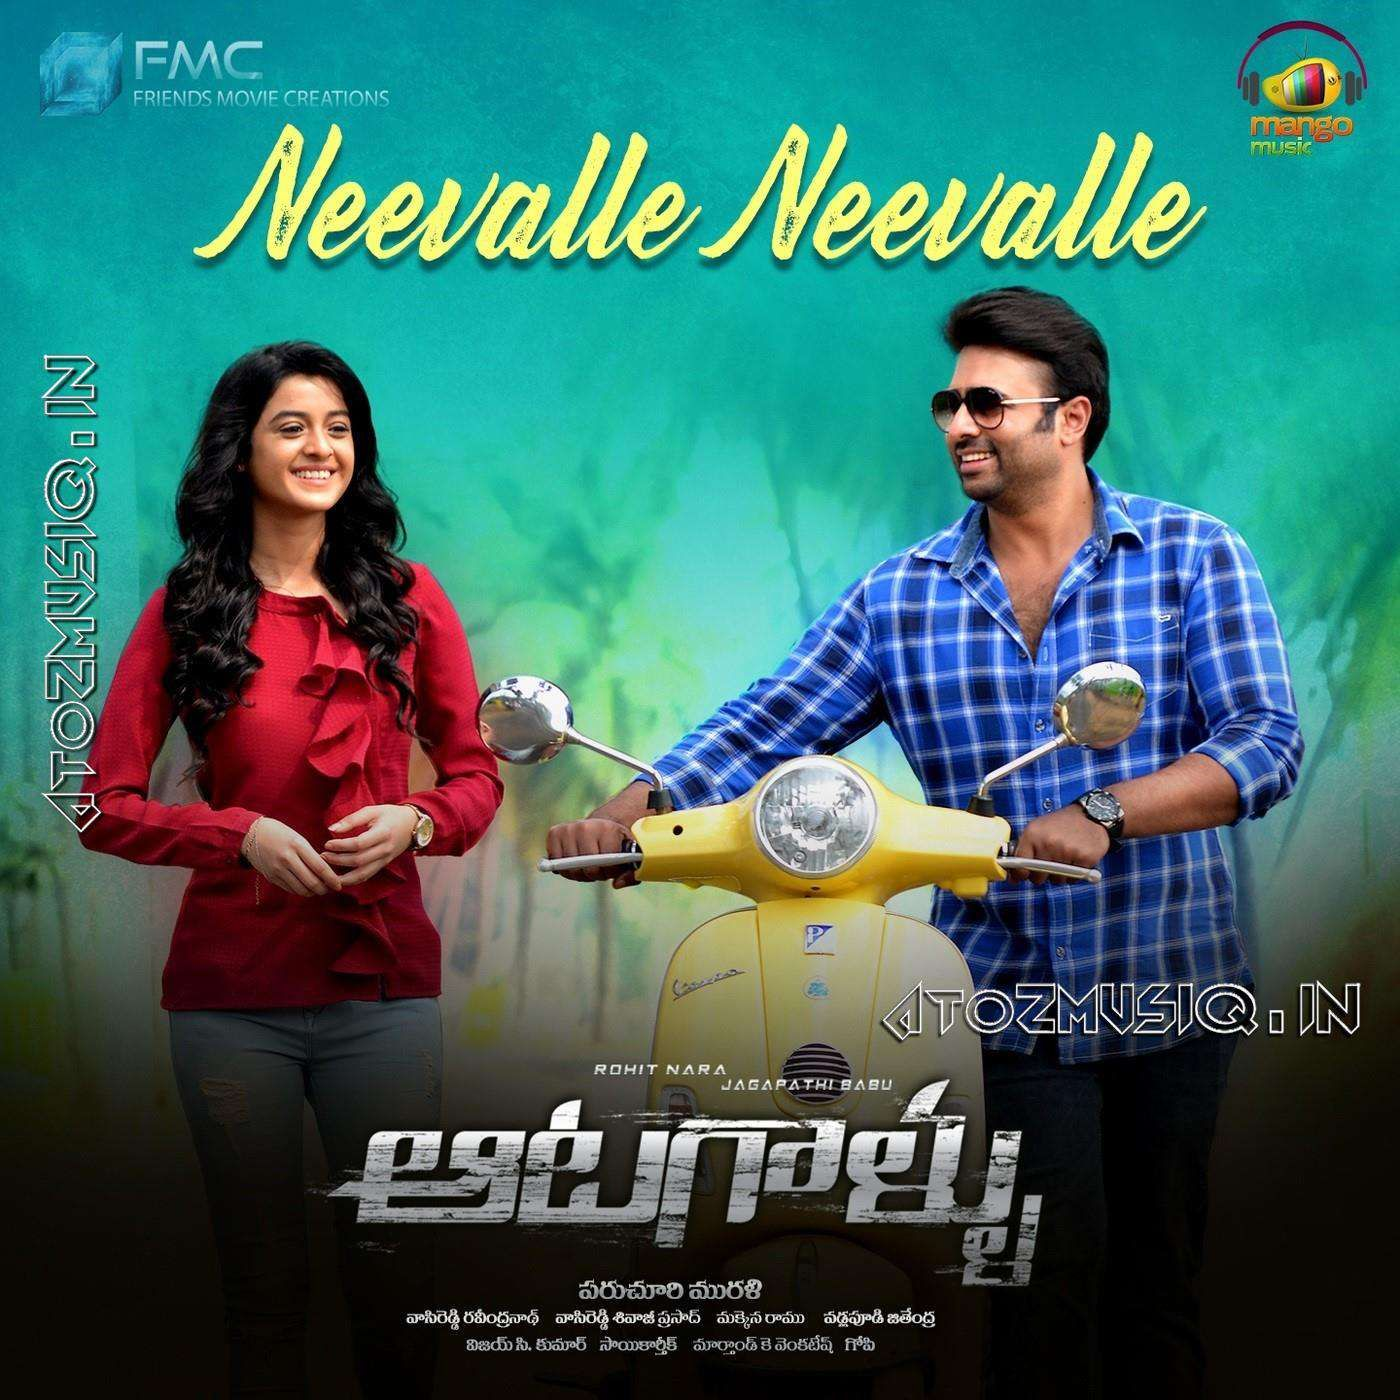 Aatagallu 2018 Telugu Mp3 Songs Free Download Mp3 Song Songs Audio Songs Free Download